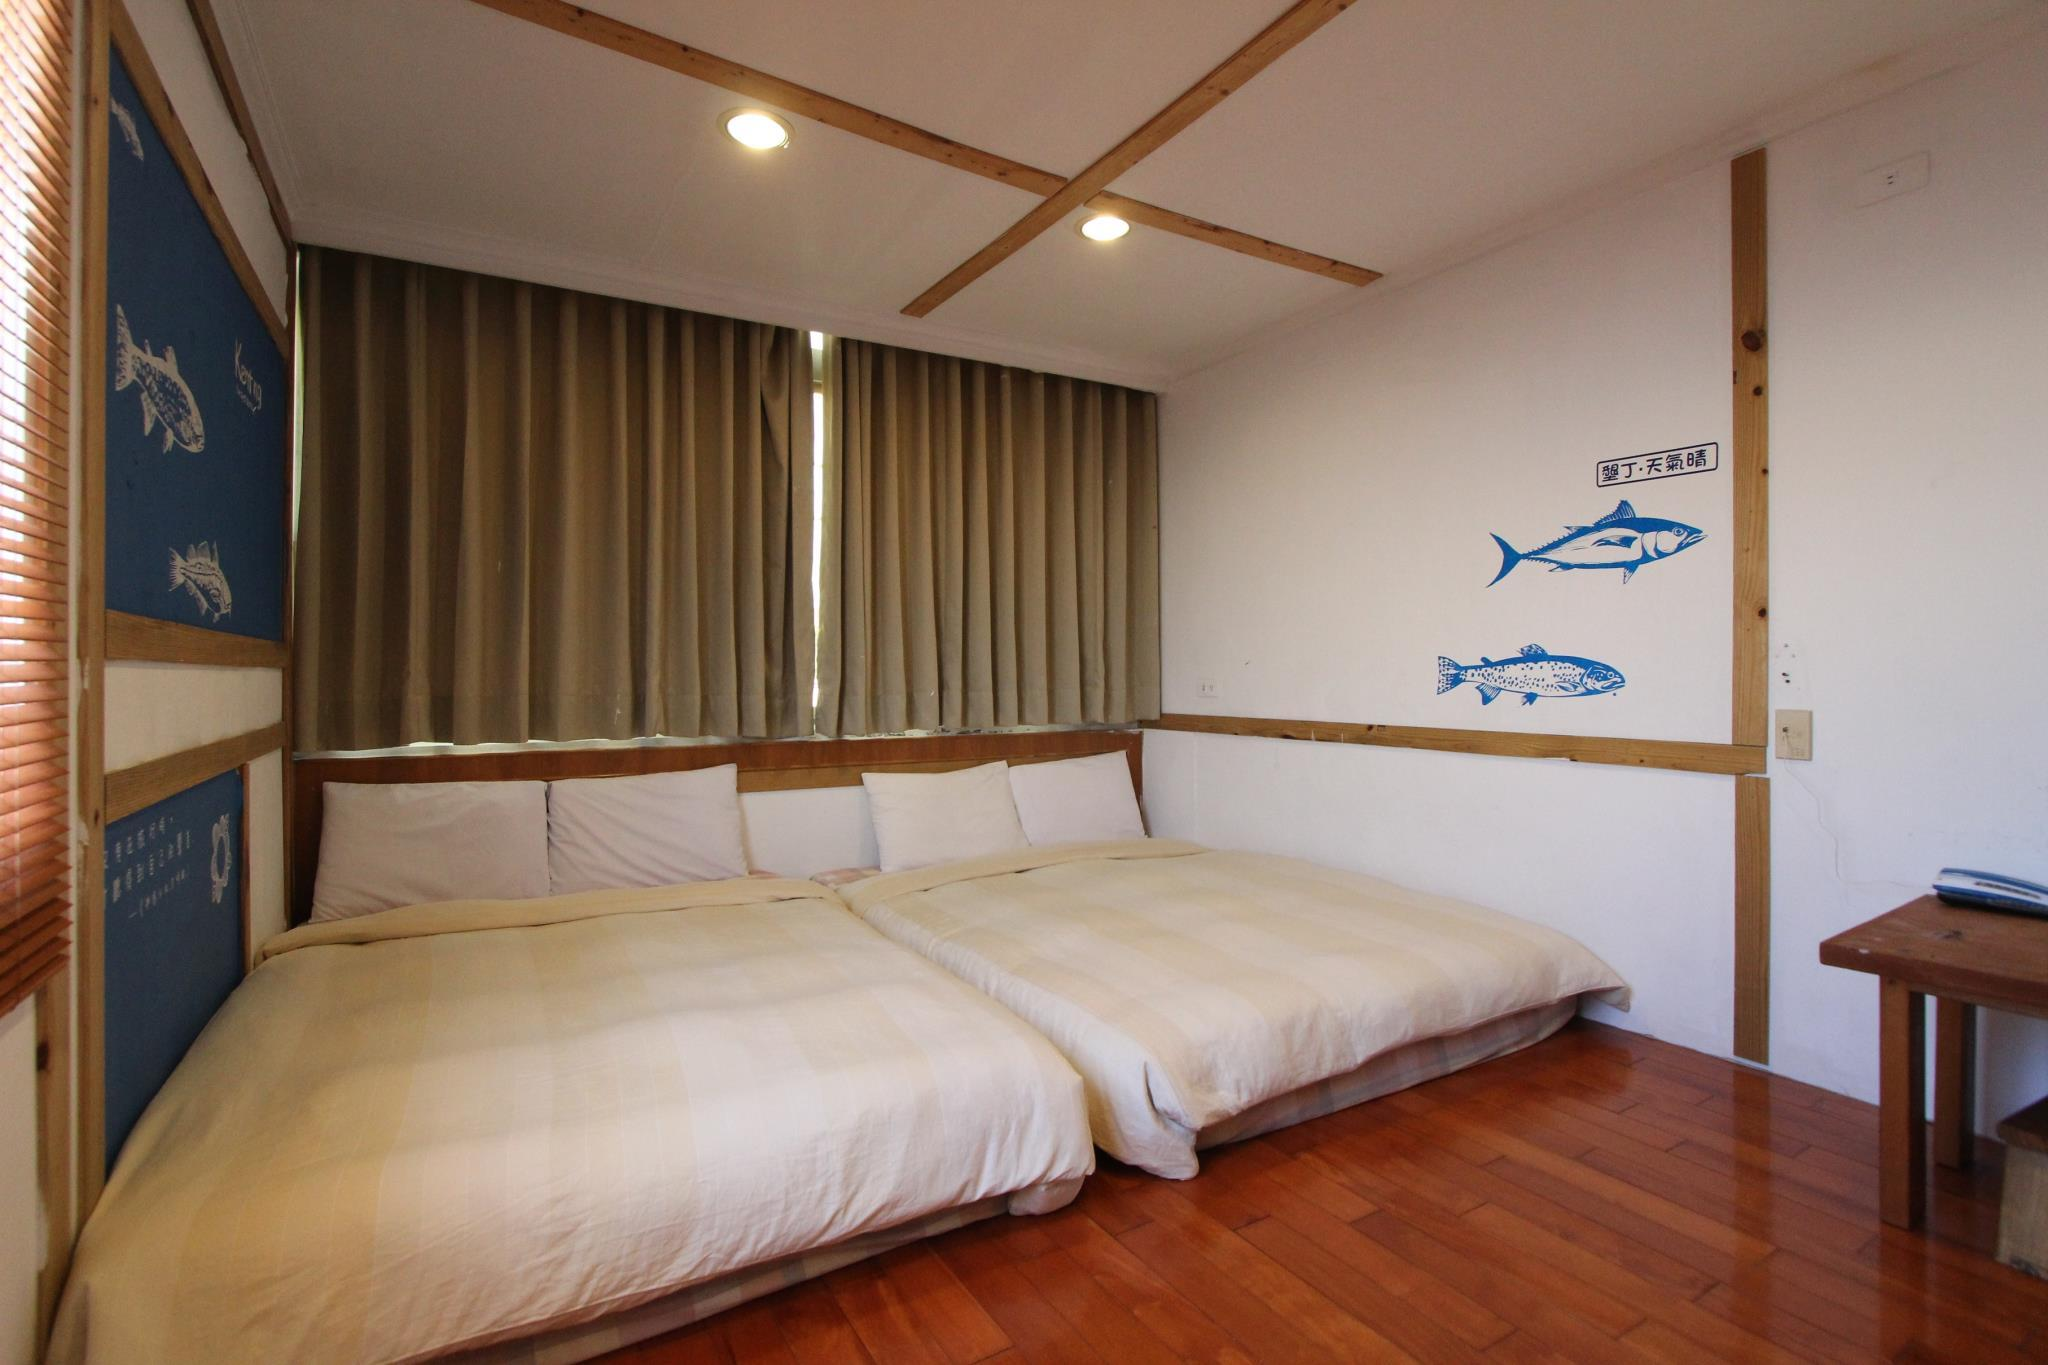 991 Travel Accommodation Line